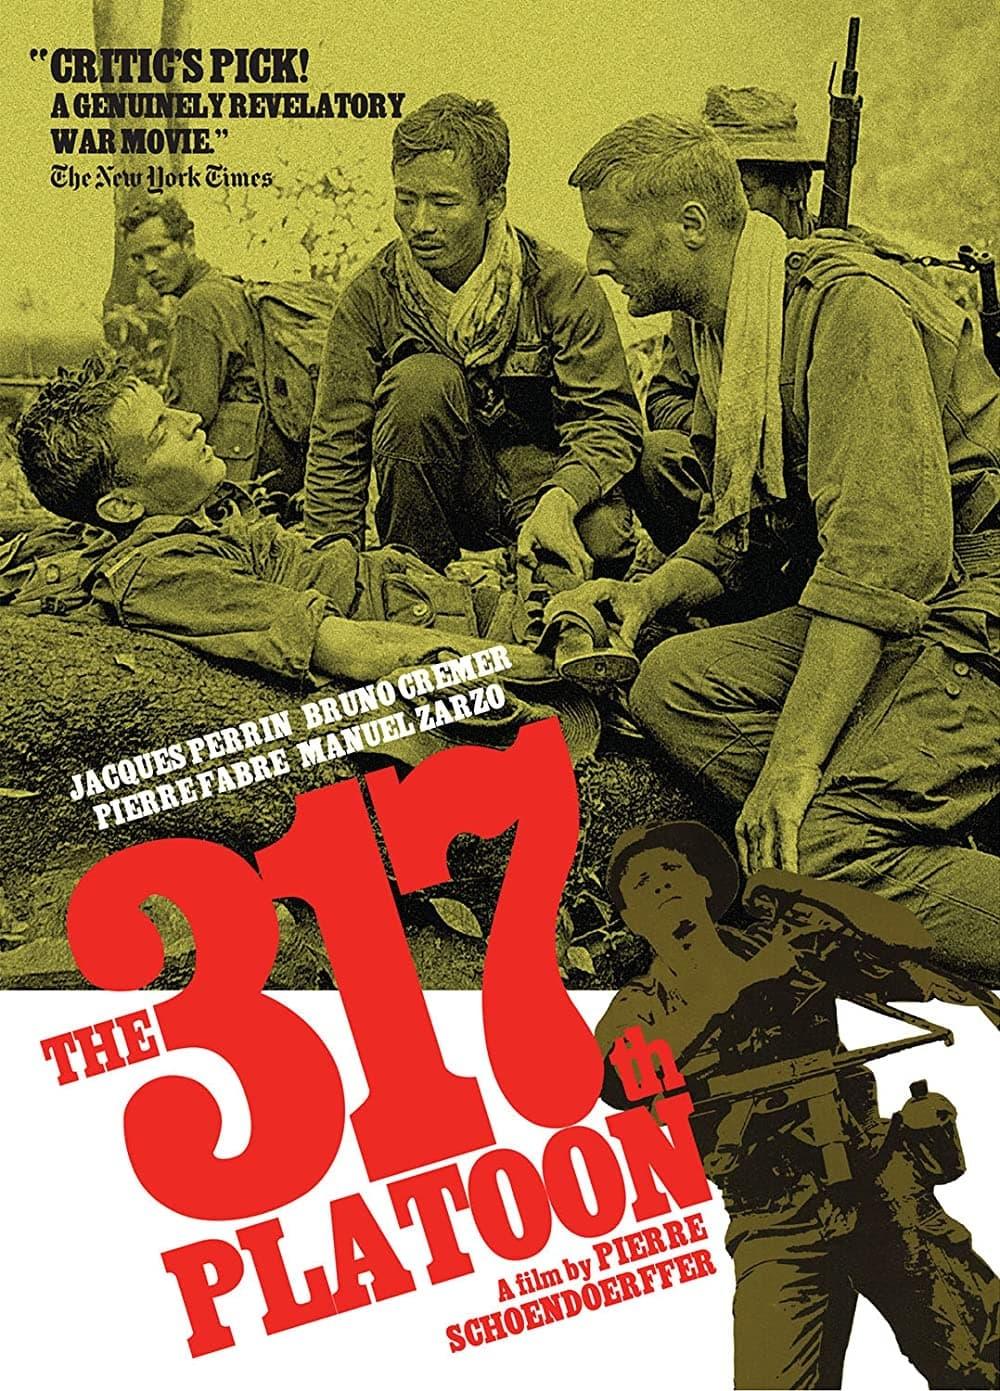 The 317th Platoon